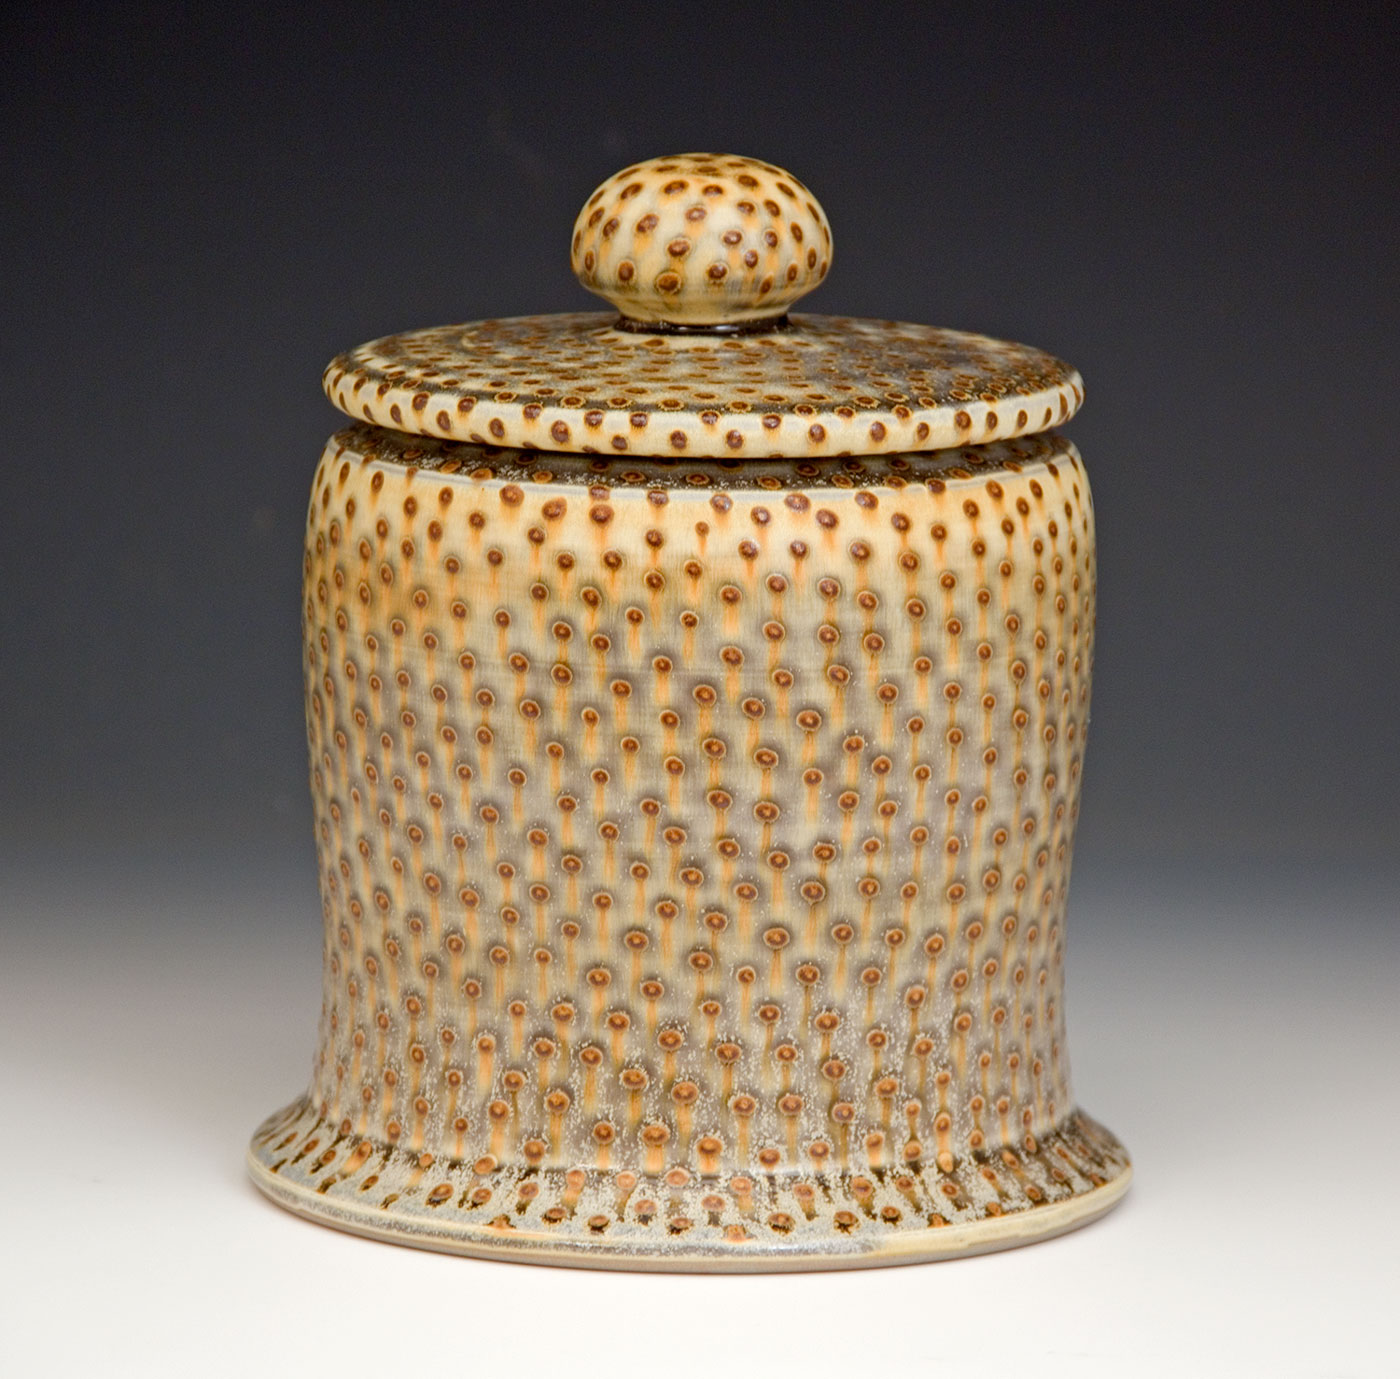 Covered-Jar-Functional-Art-Samantha-Henneke.jpg